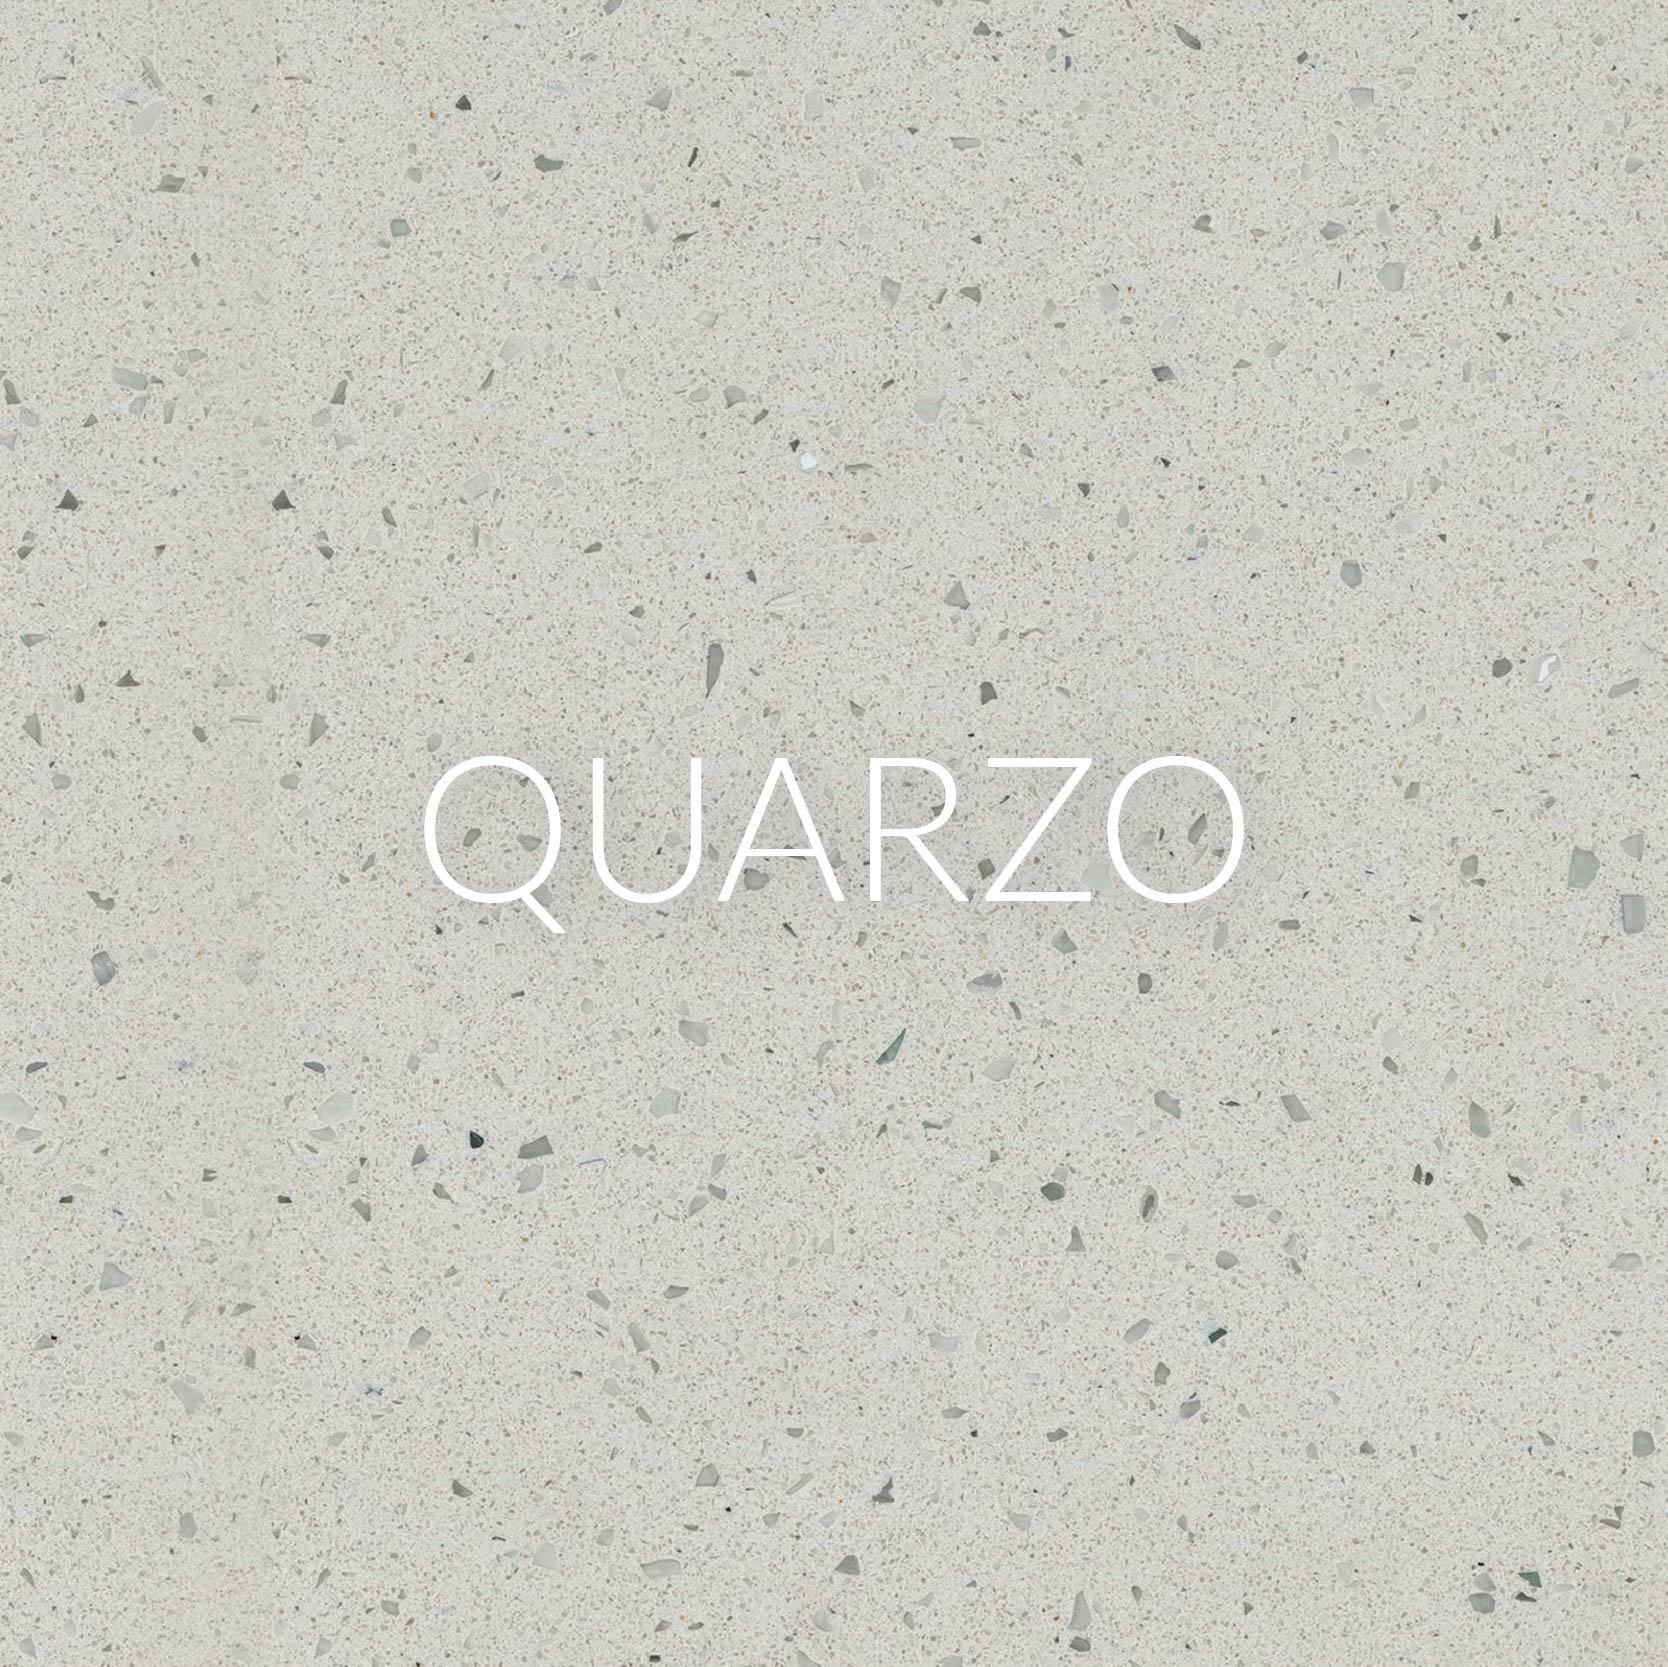 quarzo_1